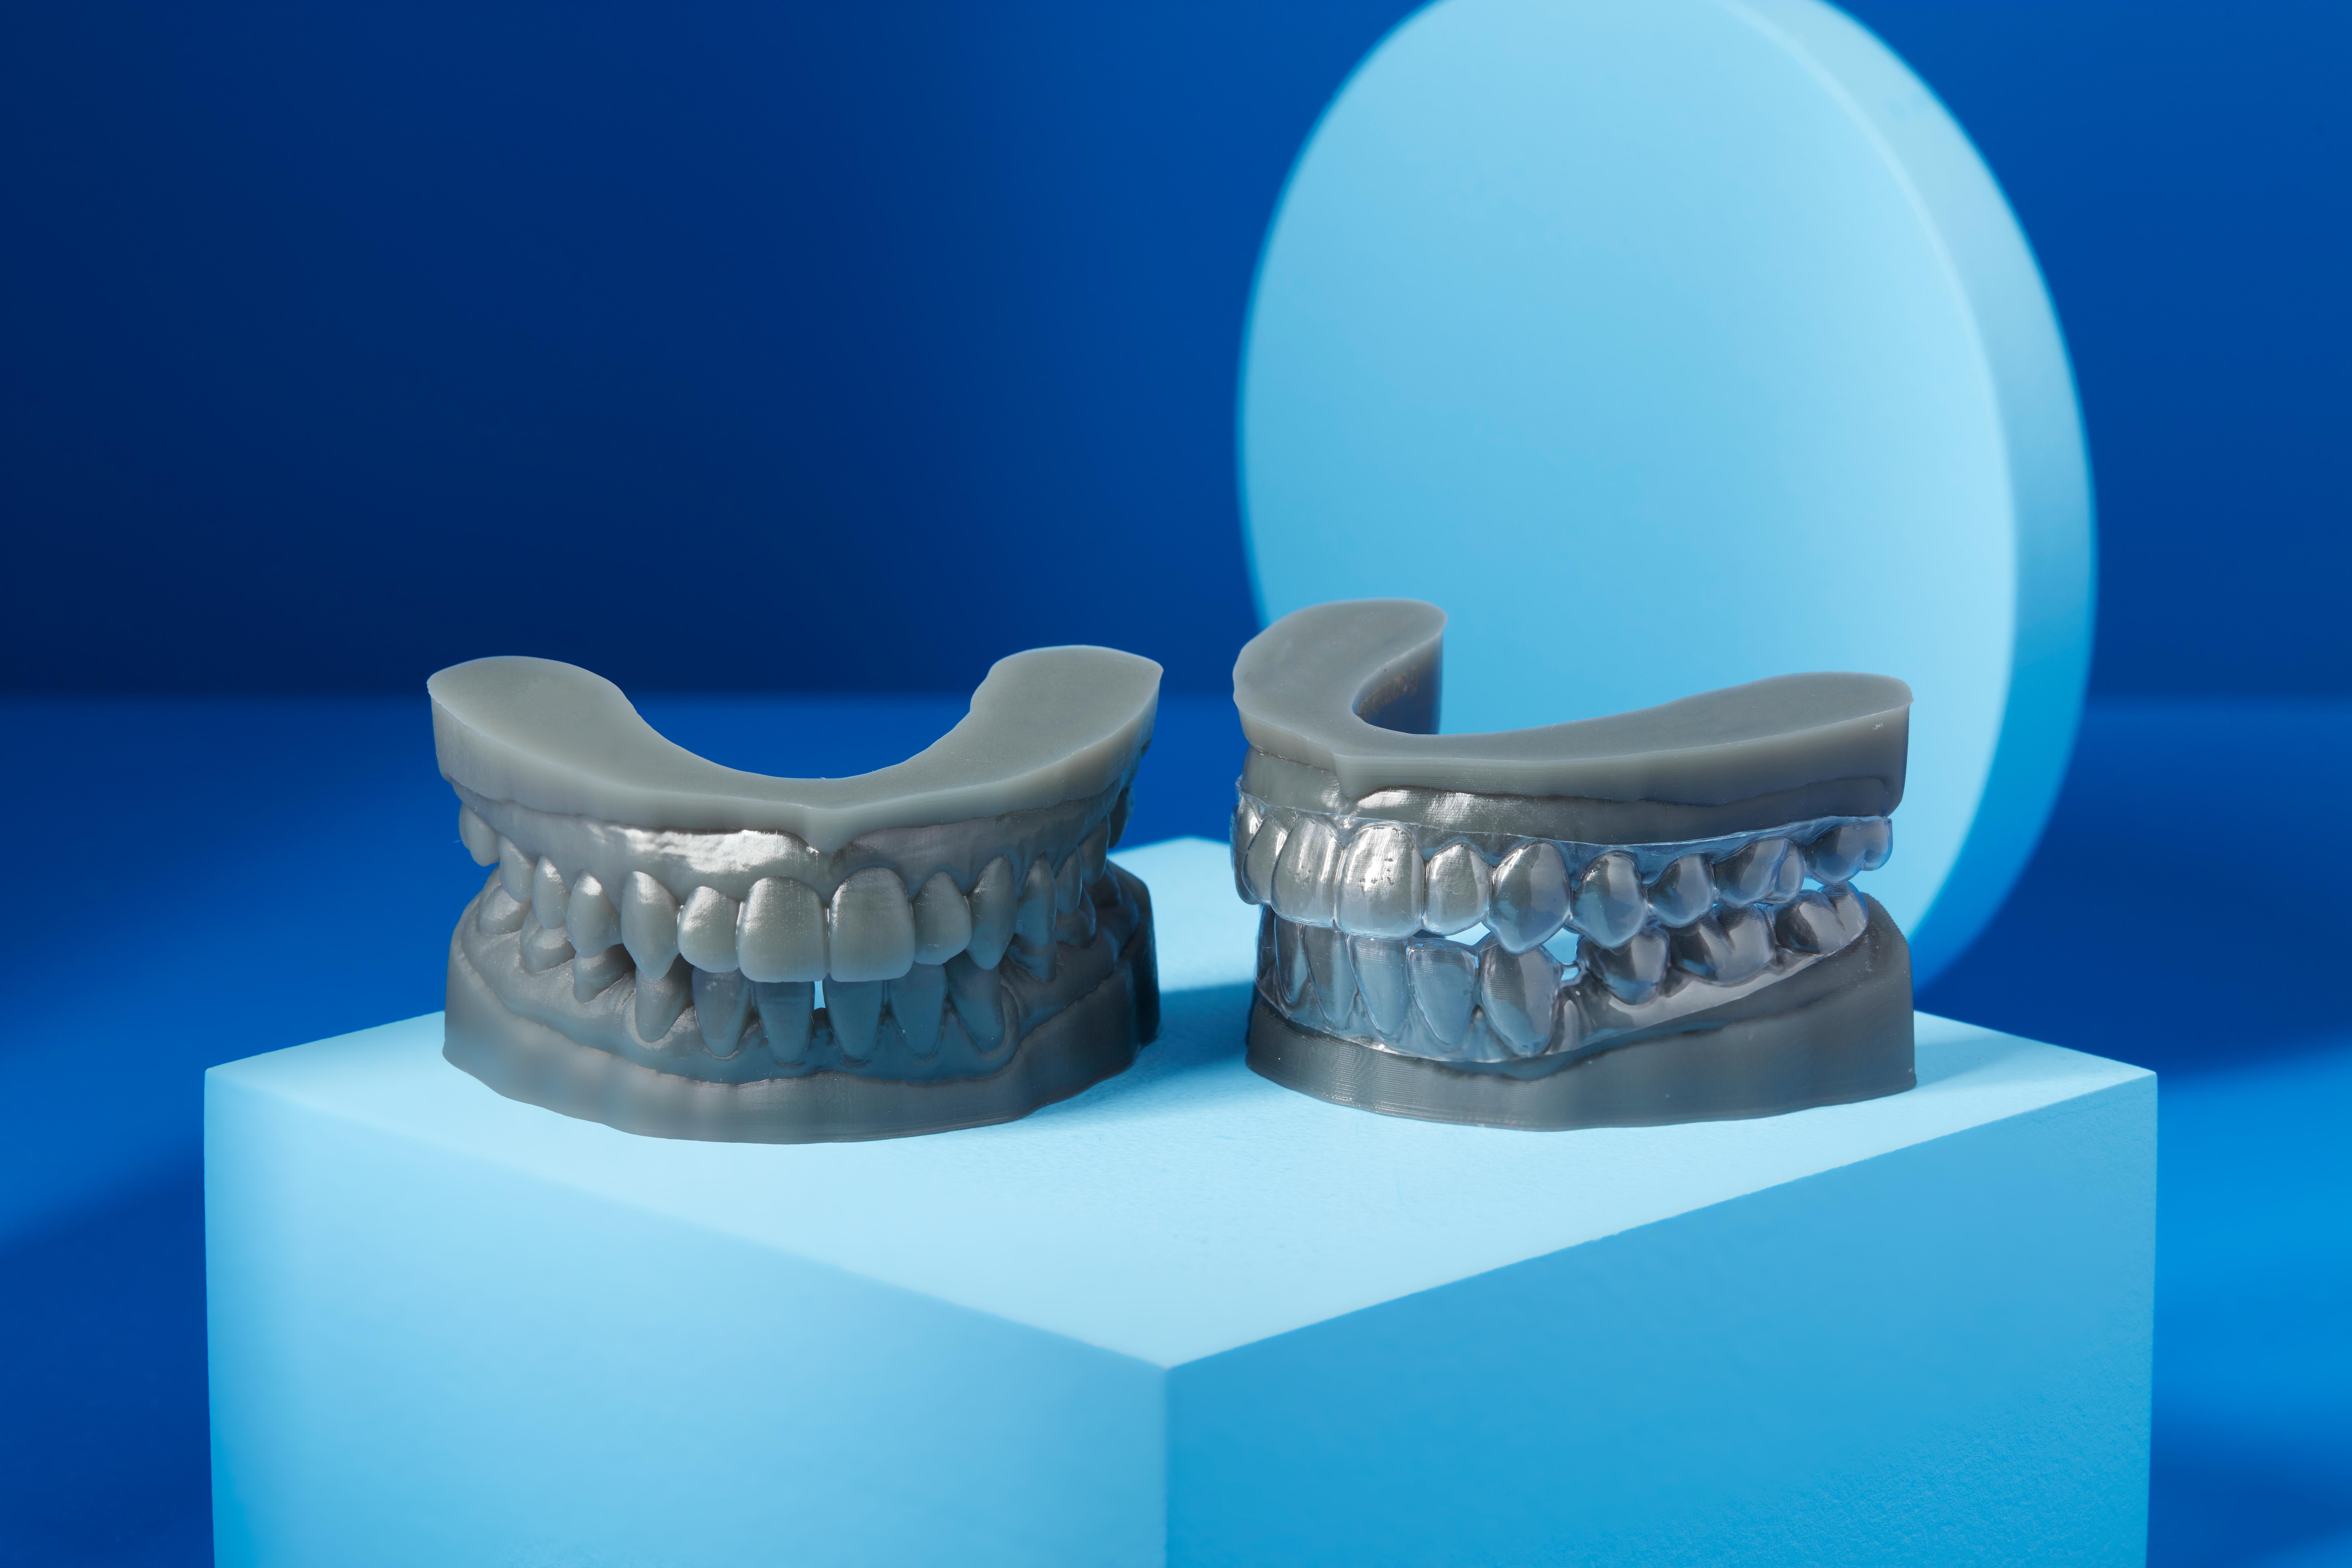 Dental models manufactured with Formlabs' Draft Resin. Image via Formlabs. Rigid 10K